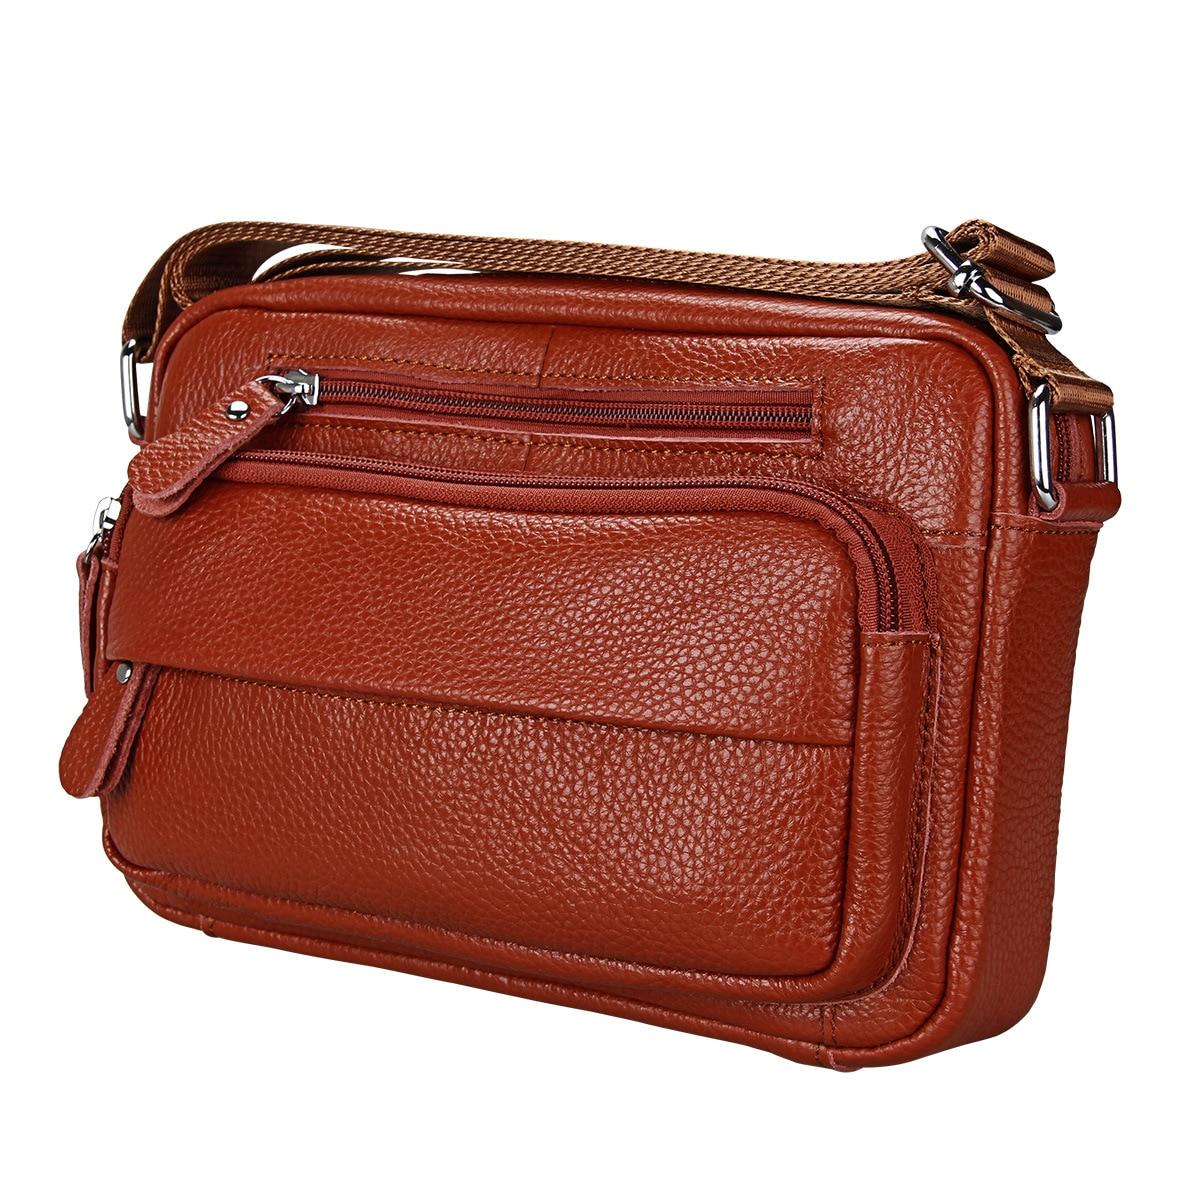 Explosive Leather Men's Top Layer Cowhide Shoulder Bag Men's Korean Outdoor Travel Messenger Bag